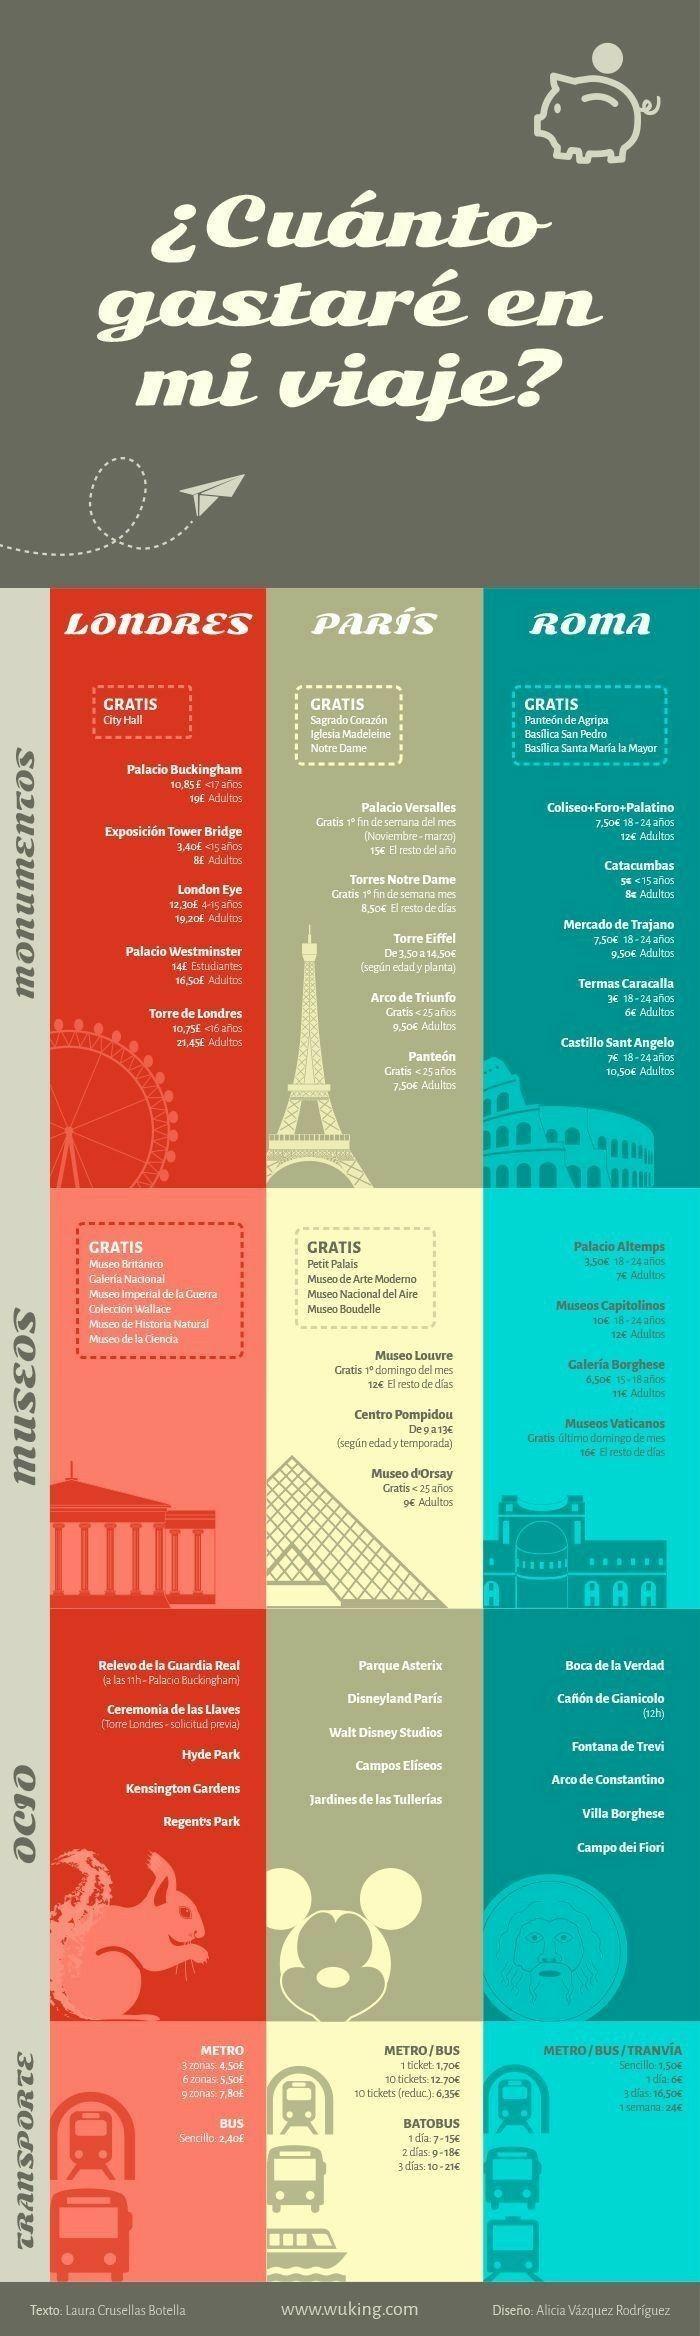 Pin by Daniela Araujo on viajes Paris travel, Paris tips